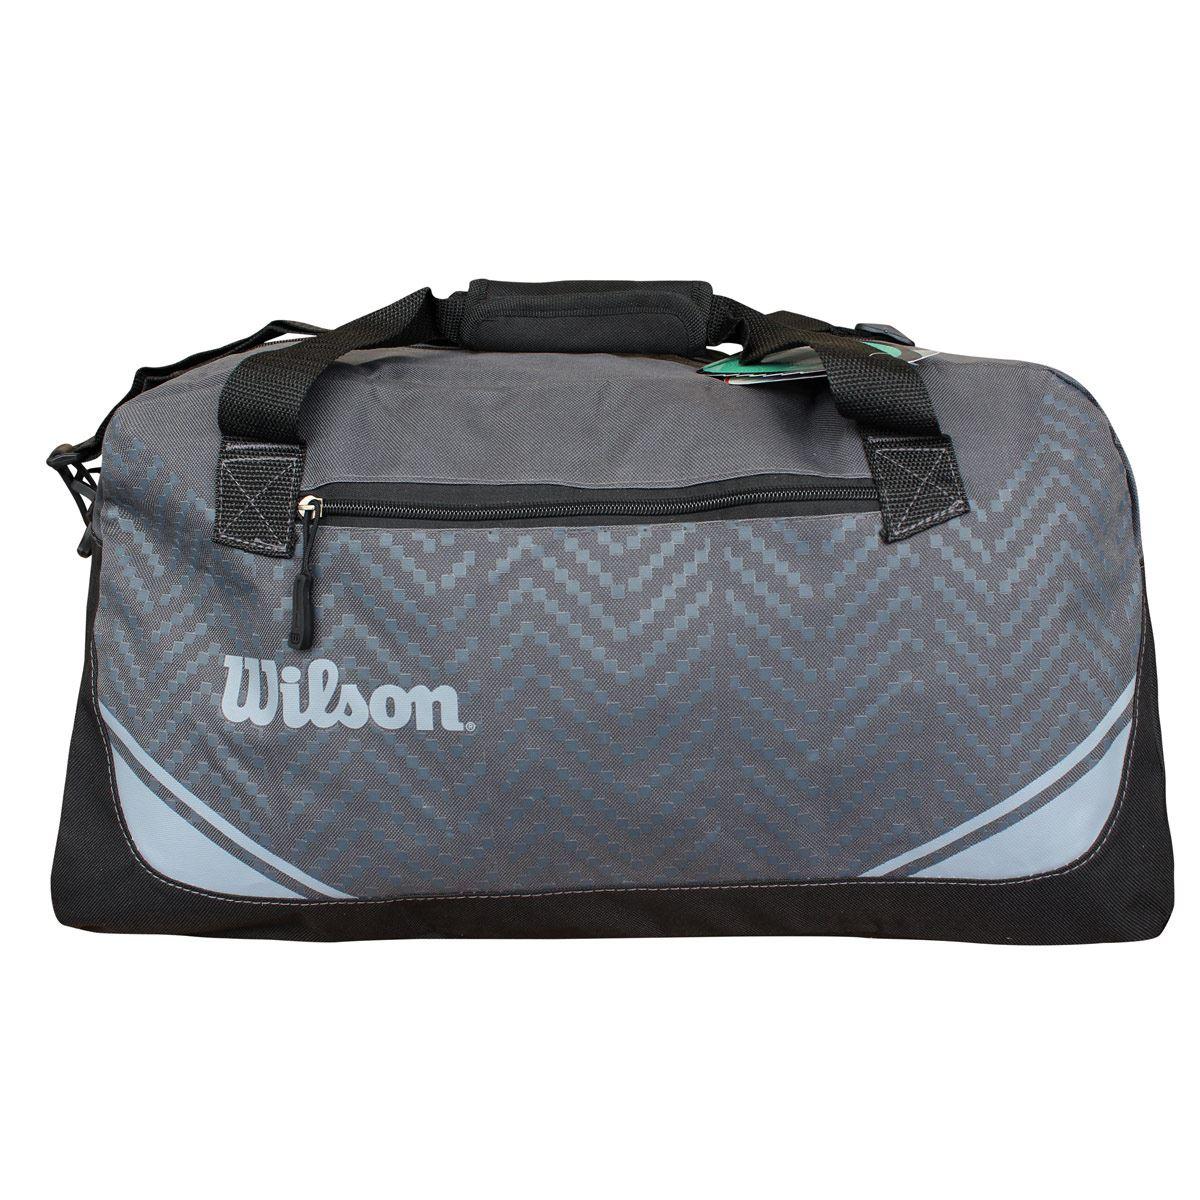 Maleta Deportiva Wilson Is-15333 Gris Negra